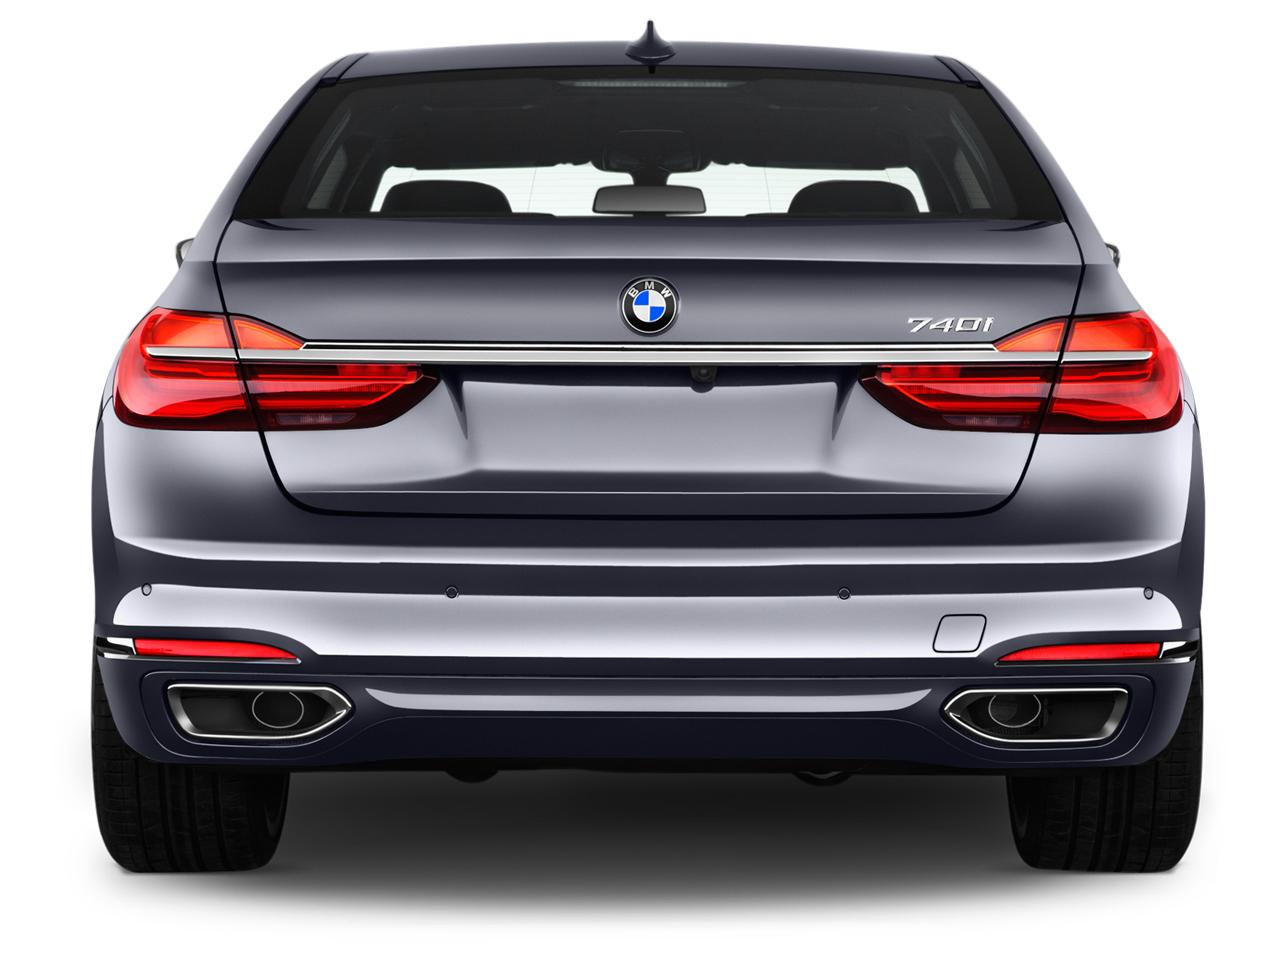 Bmw 7 Series 2018 730li In Uae New Car Prices Specs